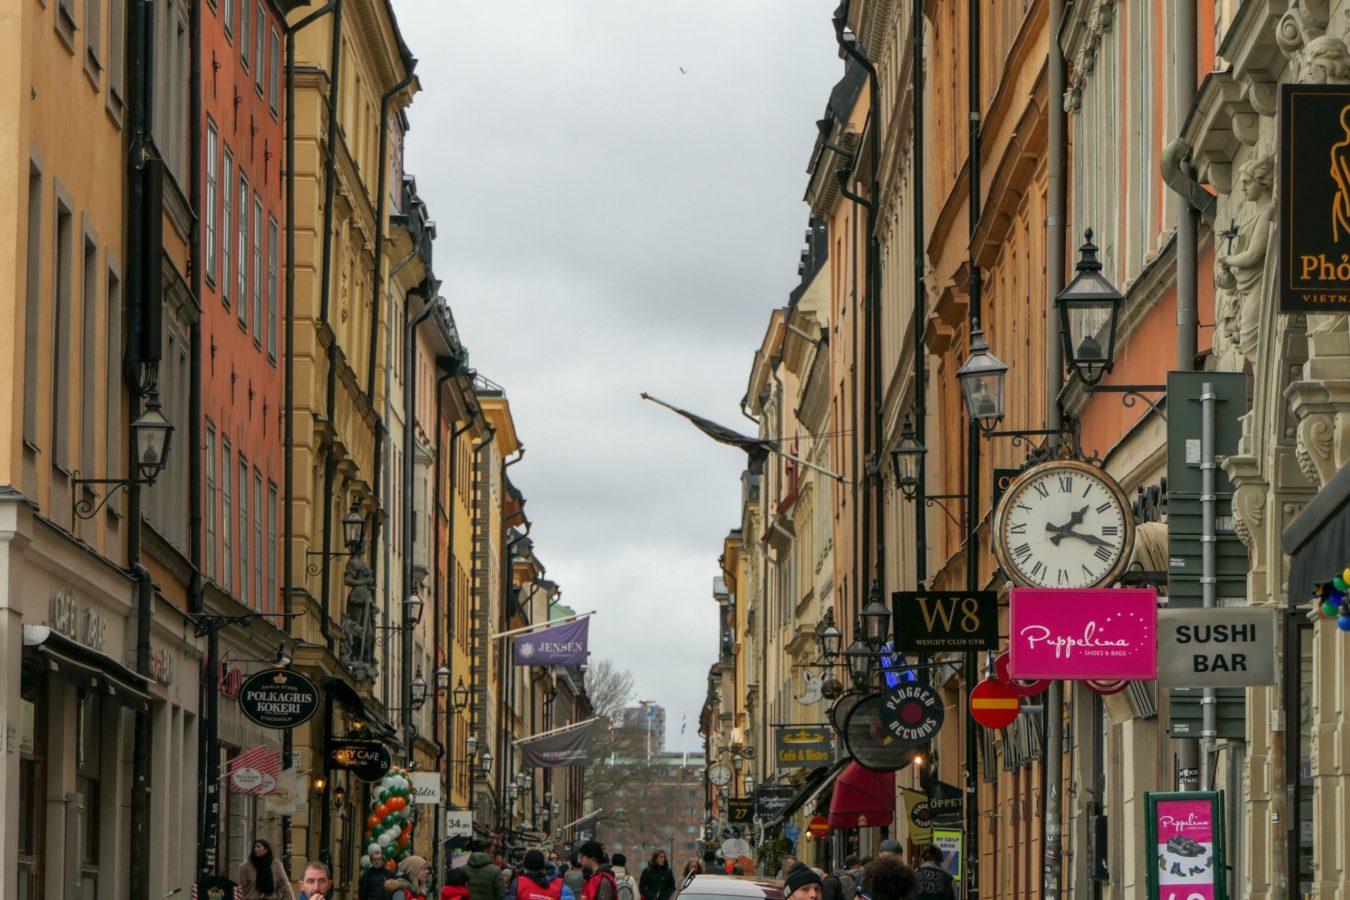 Stockholm Schweden Gamla Stan Stadsholmen Altstadt Gasse Stora Nygatan